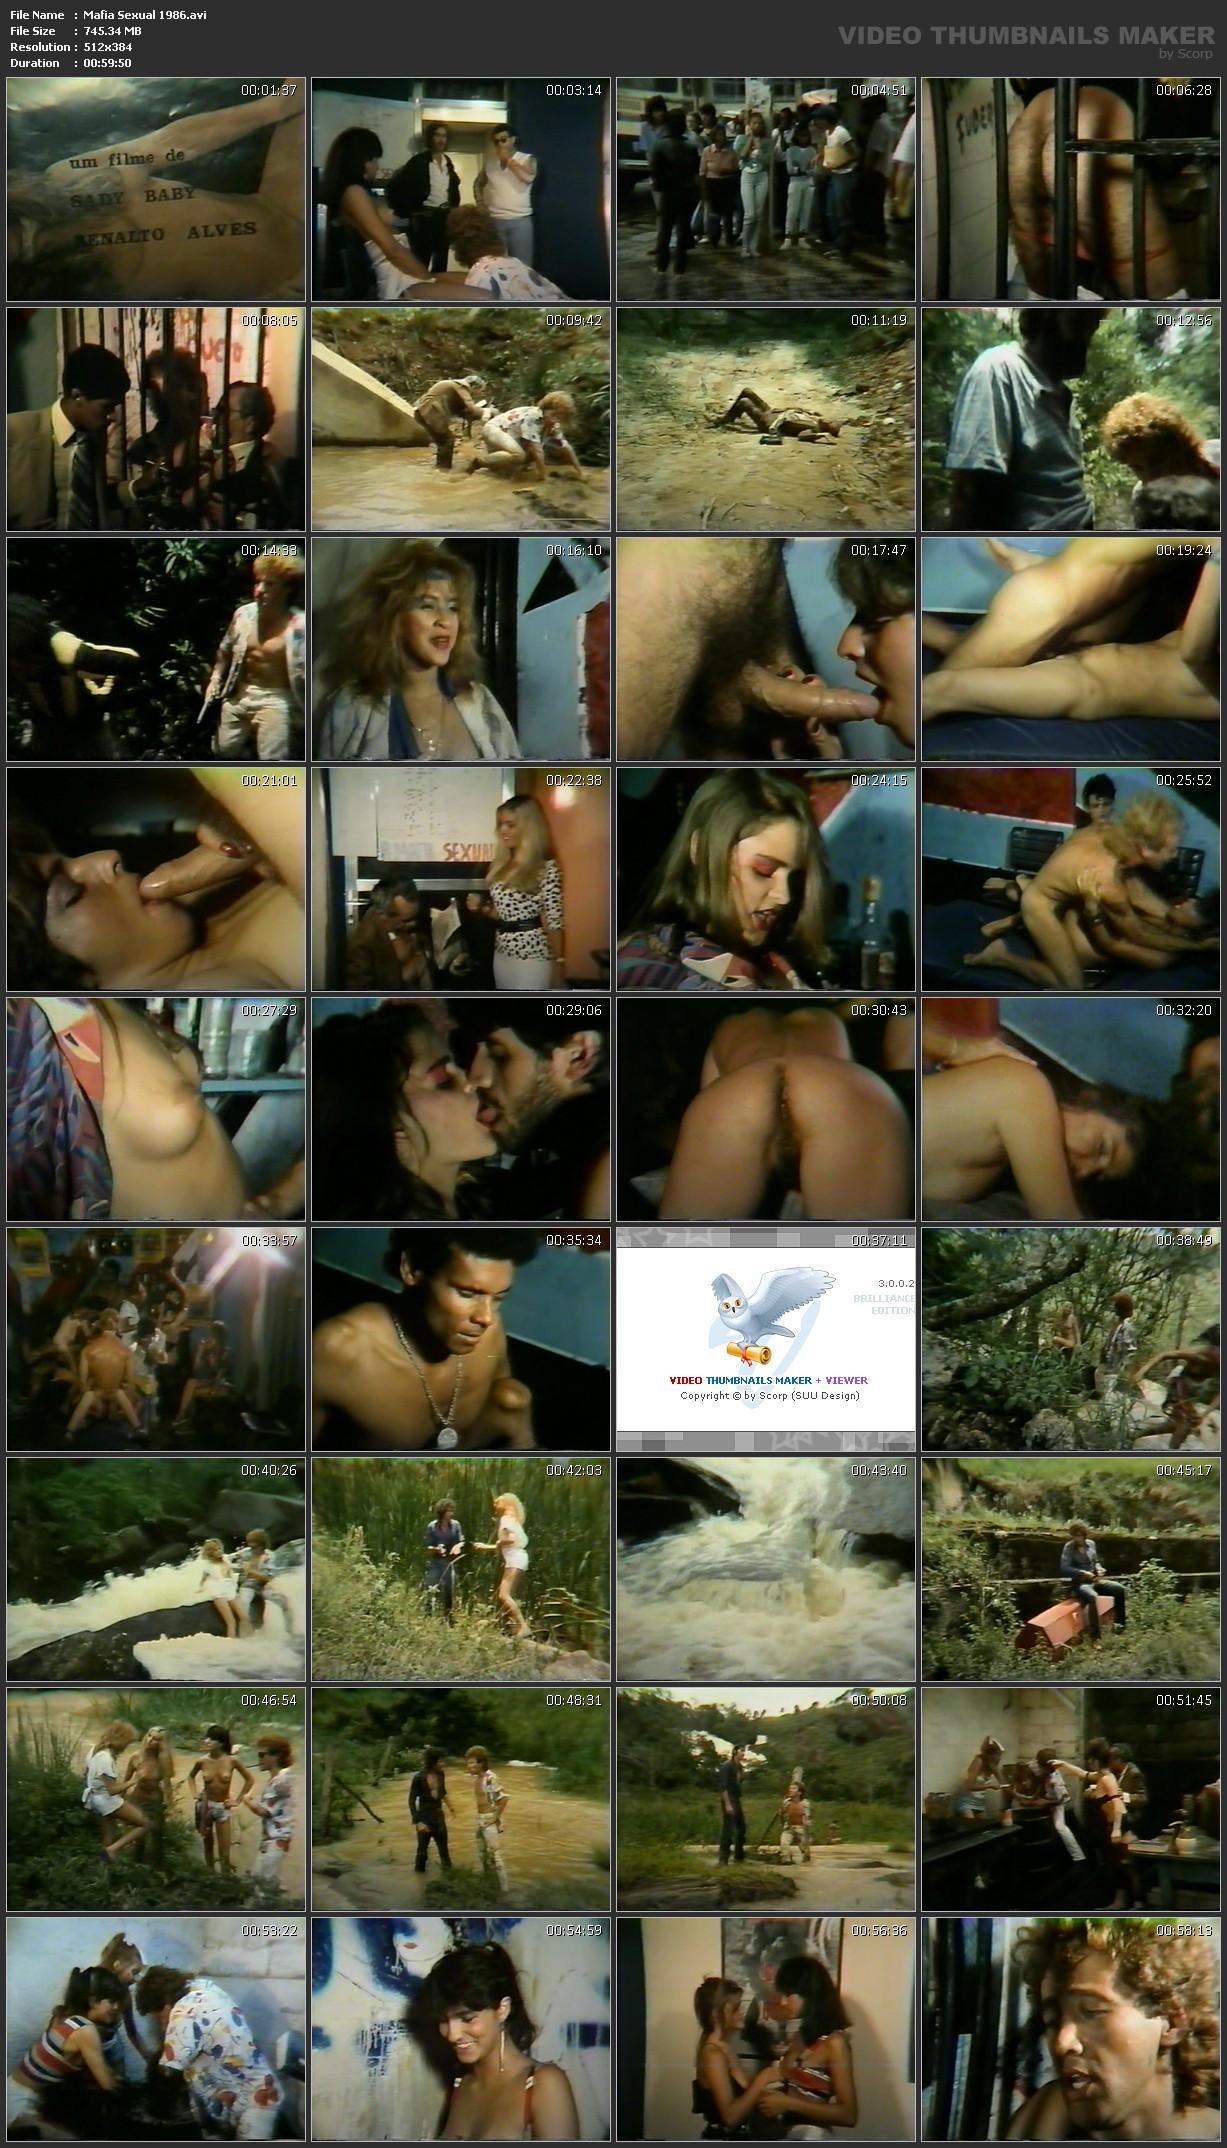 Mafia: the movie sex hentai image